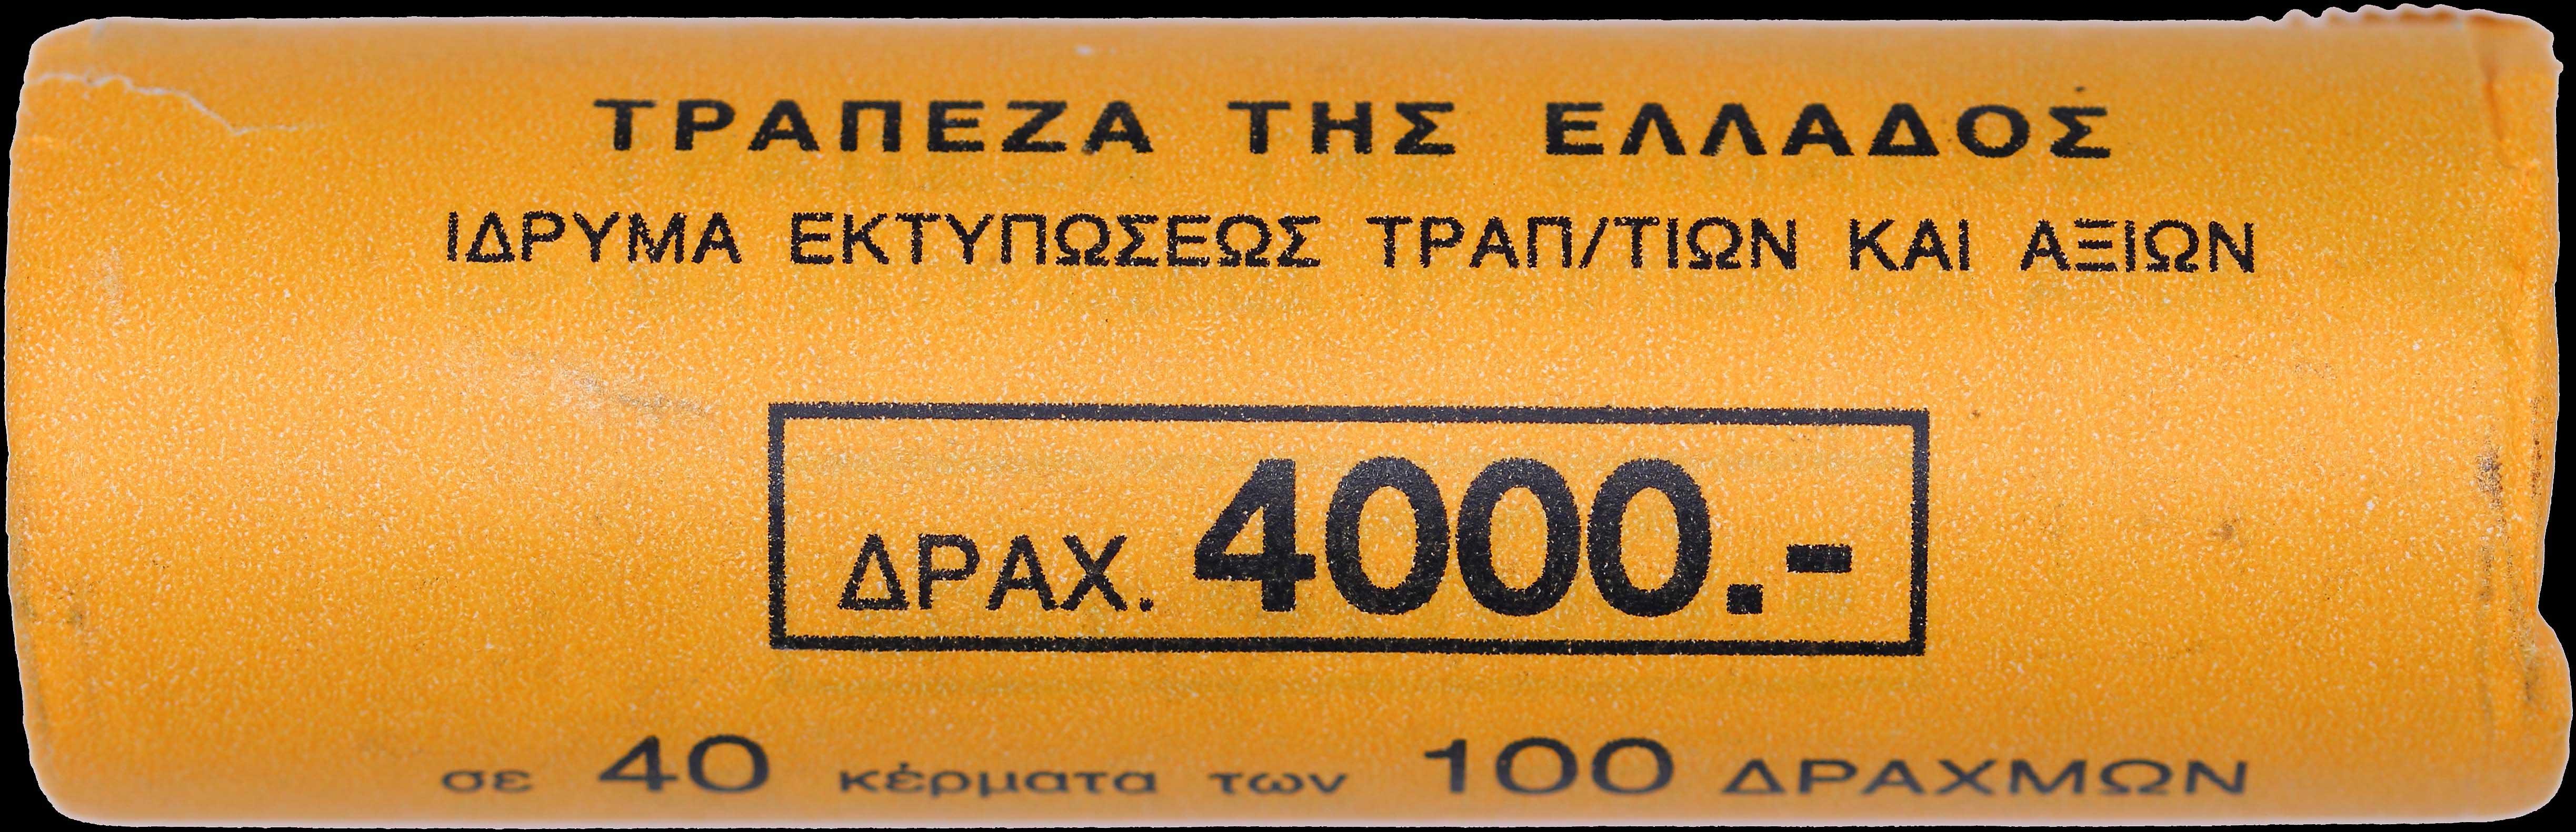 Lot 6240 - -  COINS & TOKENS HELLENIC REPUBLIC & COMMEMORATIVE ISSUES -  A. Karamitsos Public & Live Internet Auction 682 (Part A) Coins, Medals & Banknotes